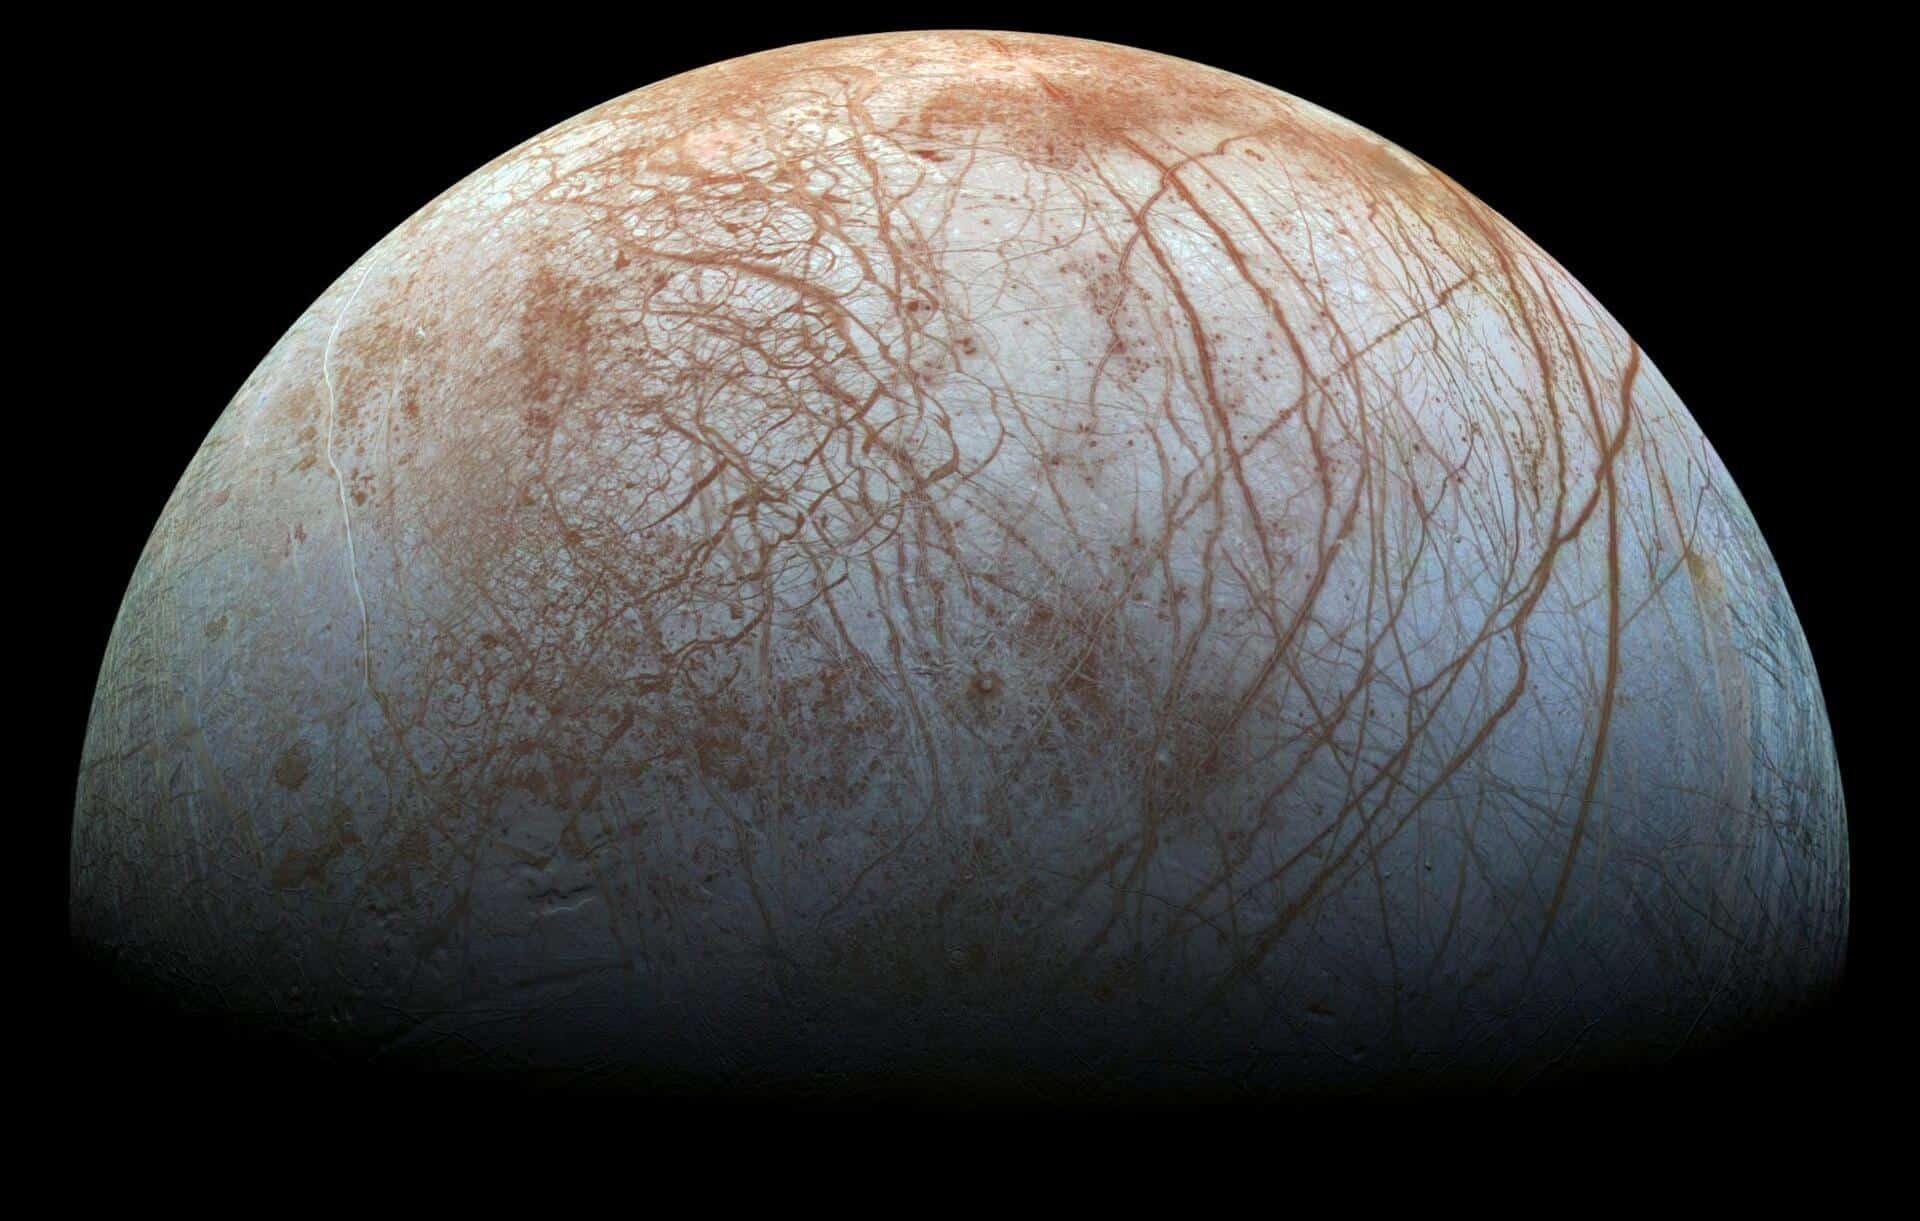 Nasa/JPL-Caltech/SETI Institute